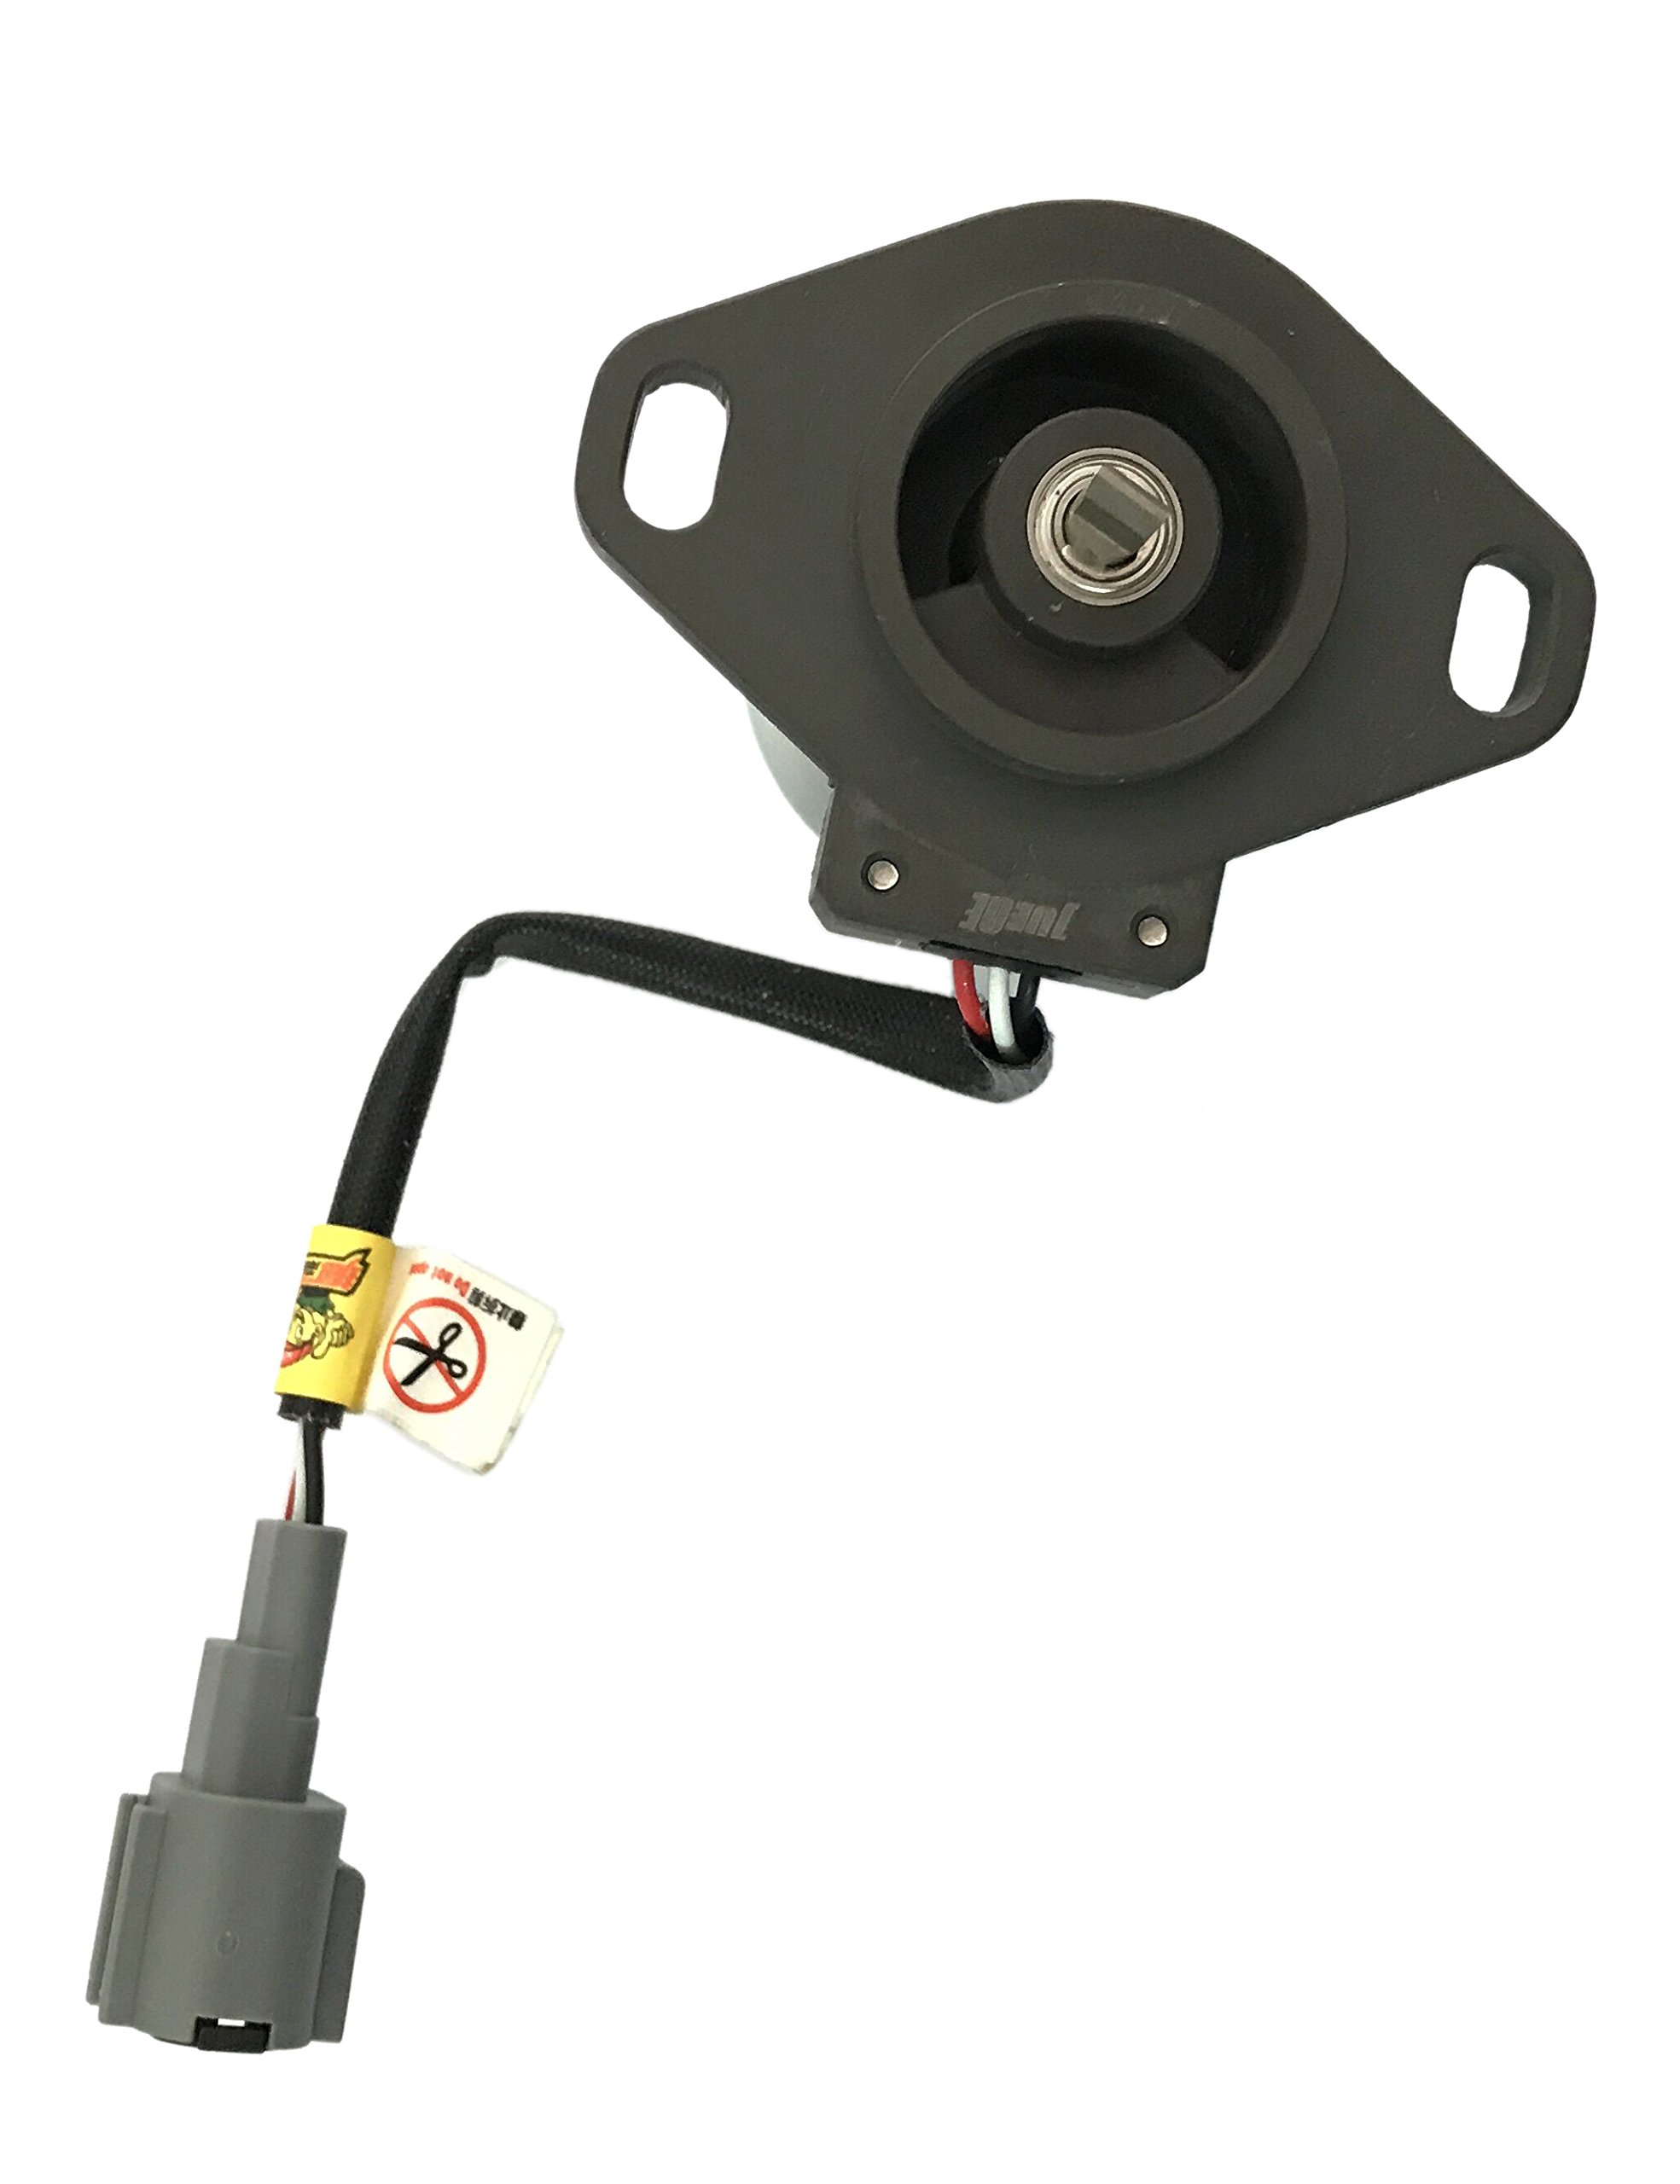 Angle Sensor 4444902 9102385 9101533 for John Deere Excavator 490E 790ELC 992ELC Hitachi Excavator EX100-2 EX100-3 EX120-2 EX120-3 EX200-2 EX200-3 EX220-2 EX220-3